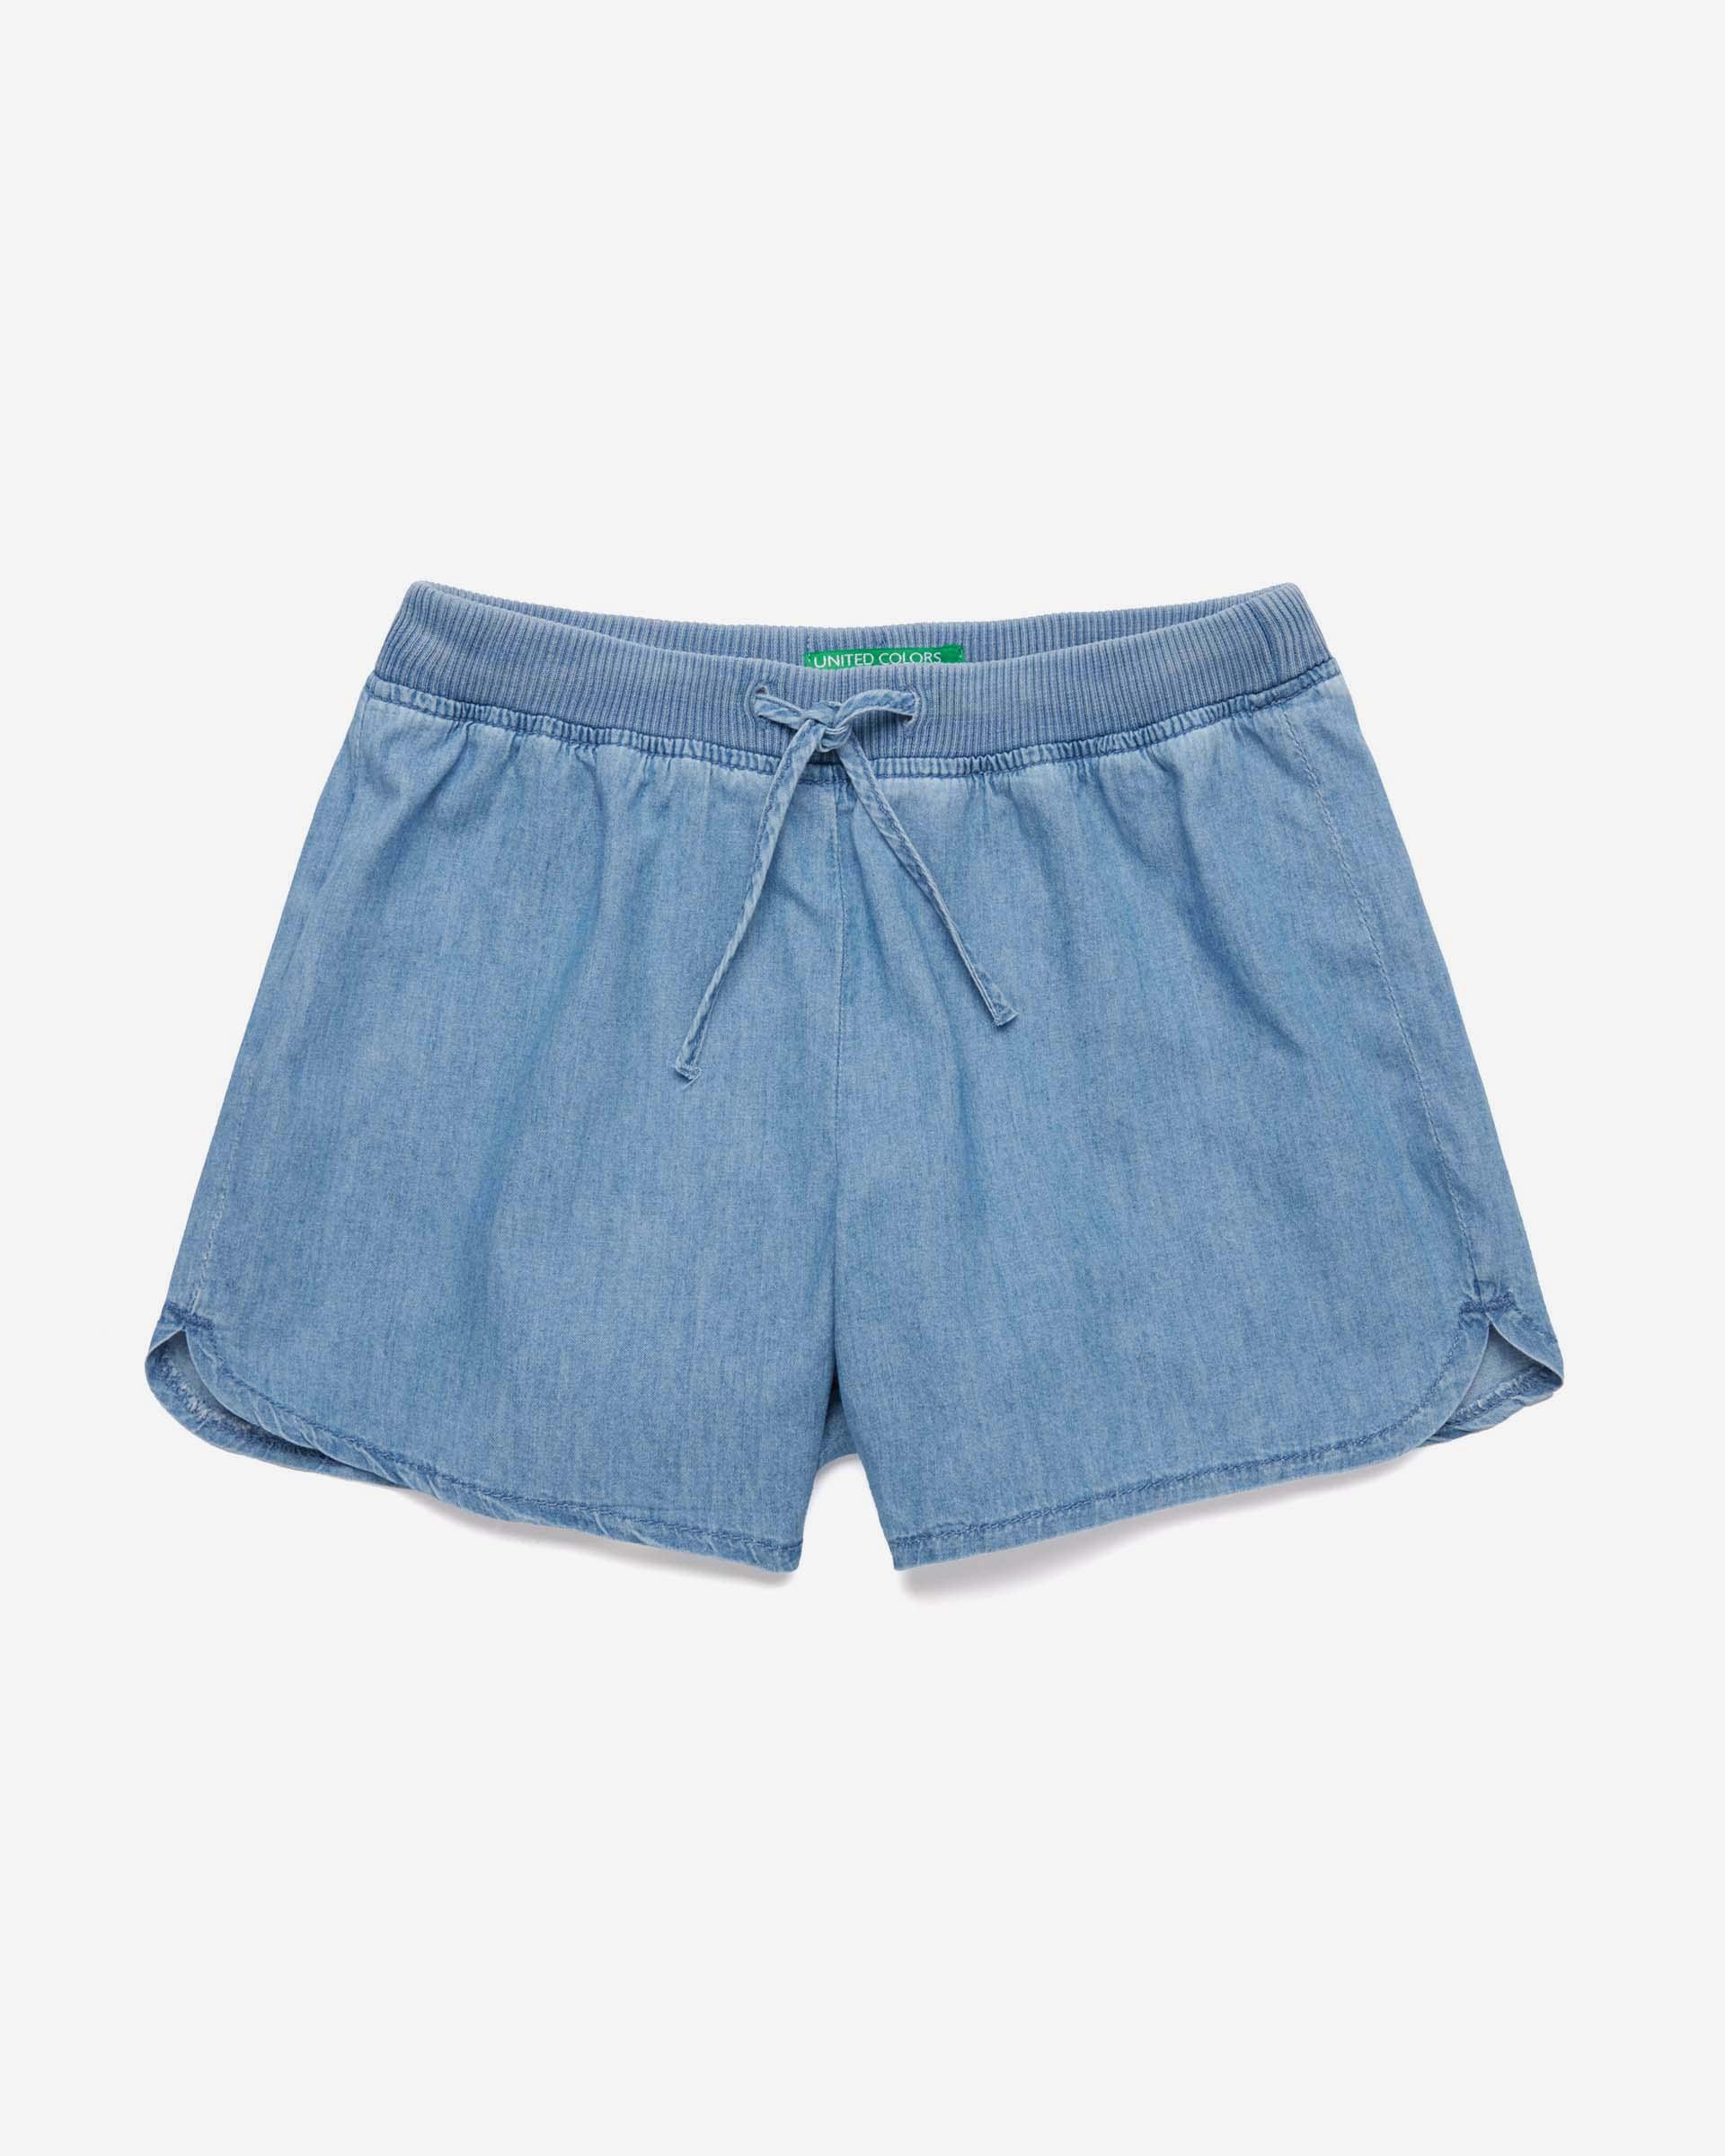 Купить 20P_4DHJ59E30_902, Шорты для девочек Benetton 4DHJ59E30_902 р-р 128, United Colors of Benetton